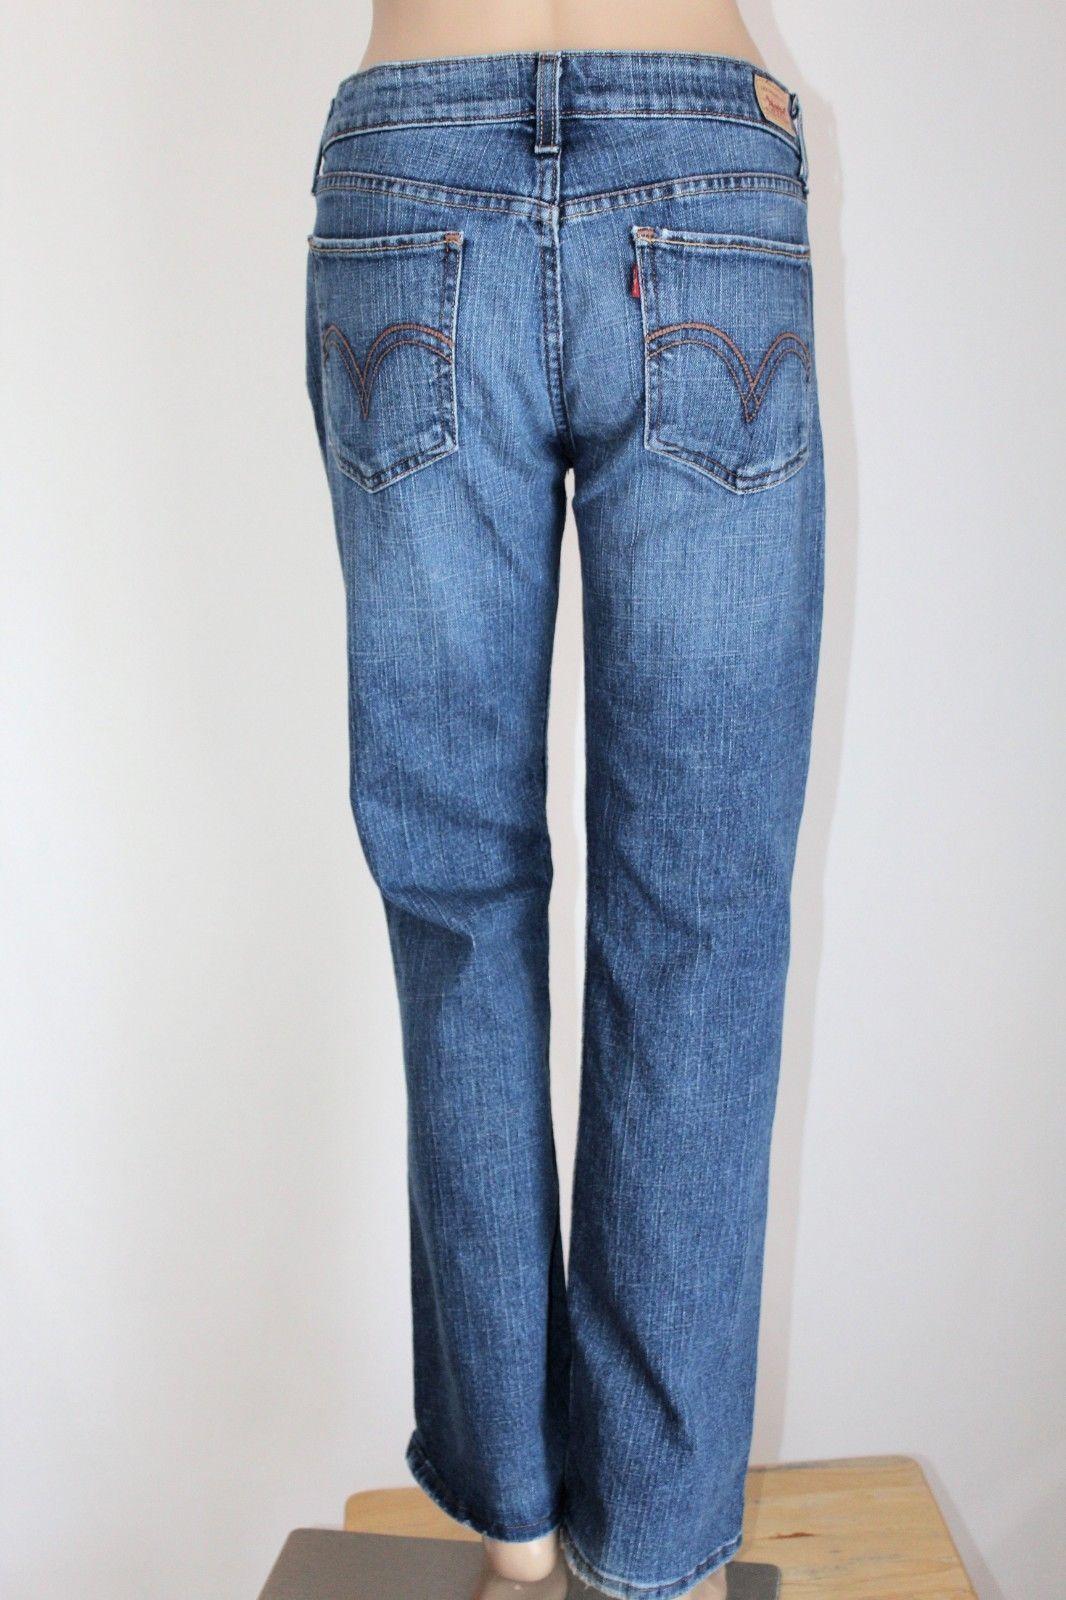 e243aab714e S l1600. S l1600. Previous. LEVI'S 518 Junior Women's Size 11 Short SuperLow  Boot Cut Stretch Jeans